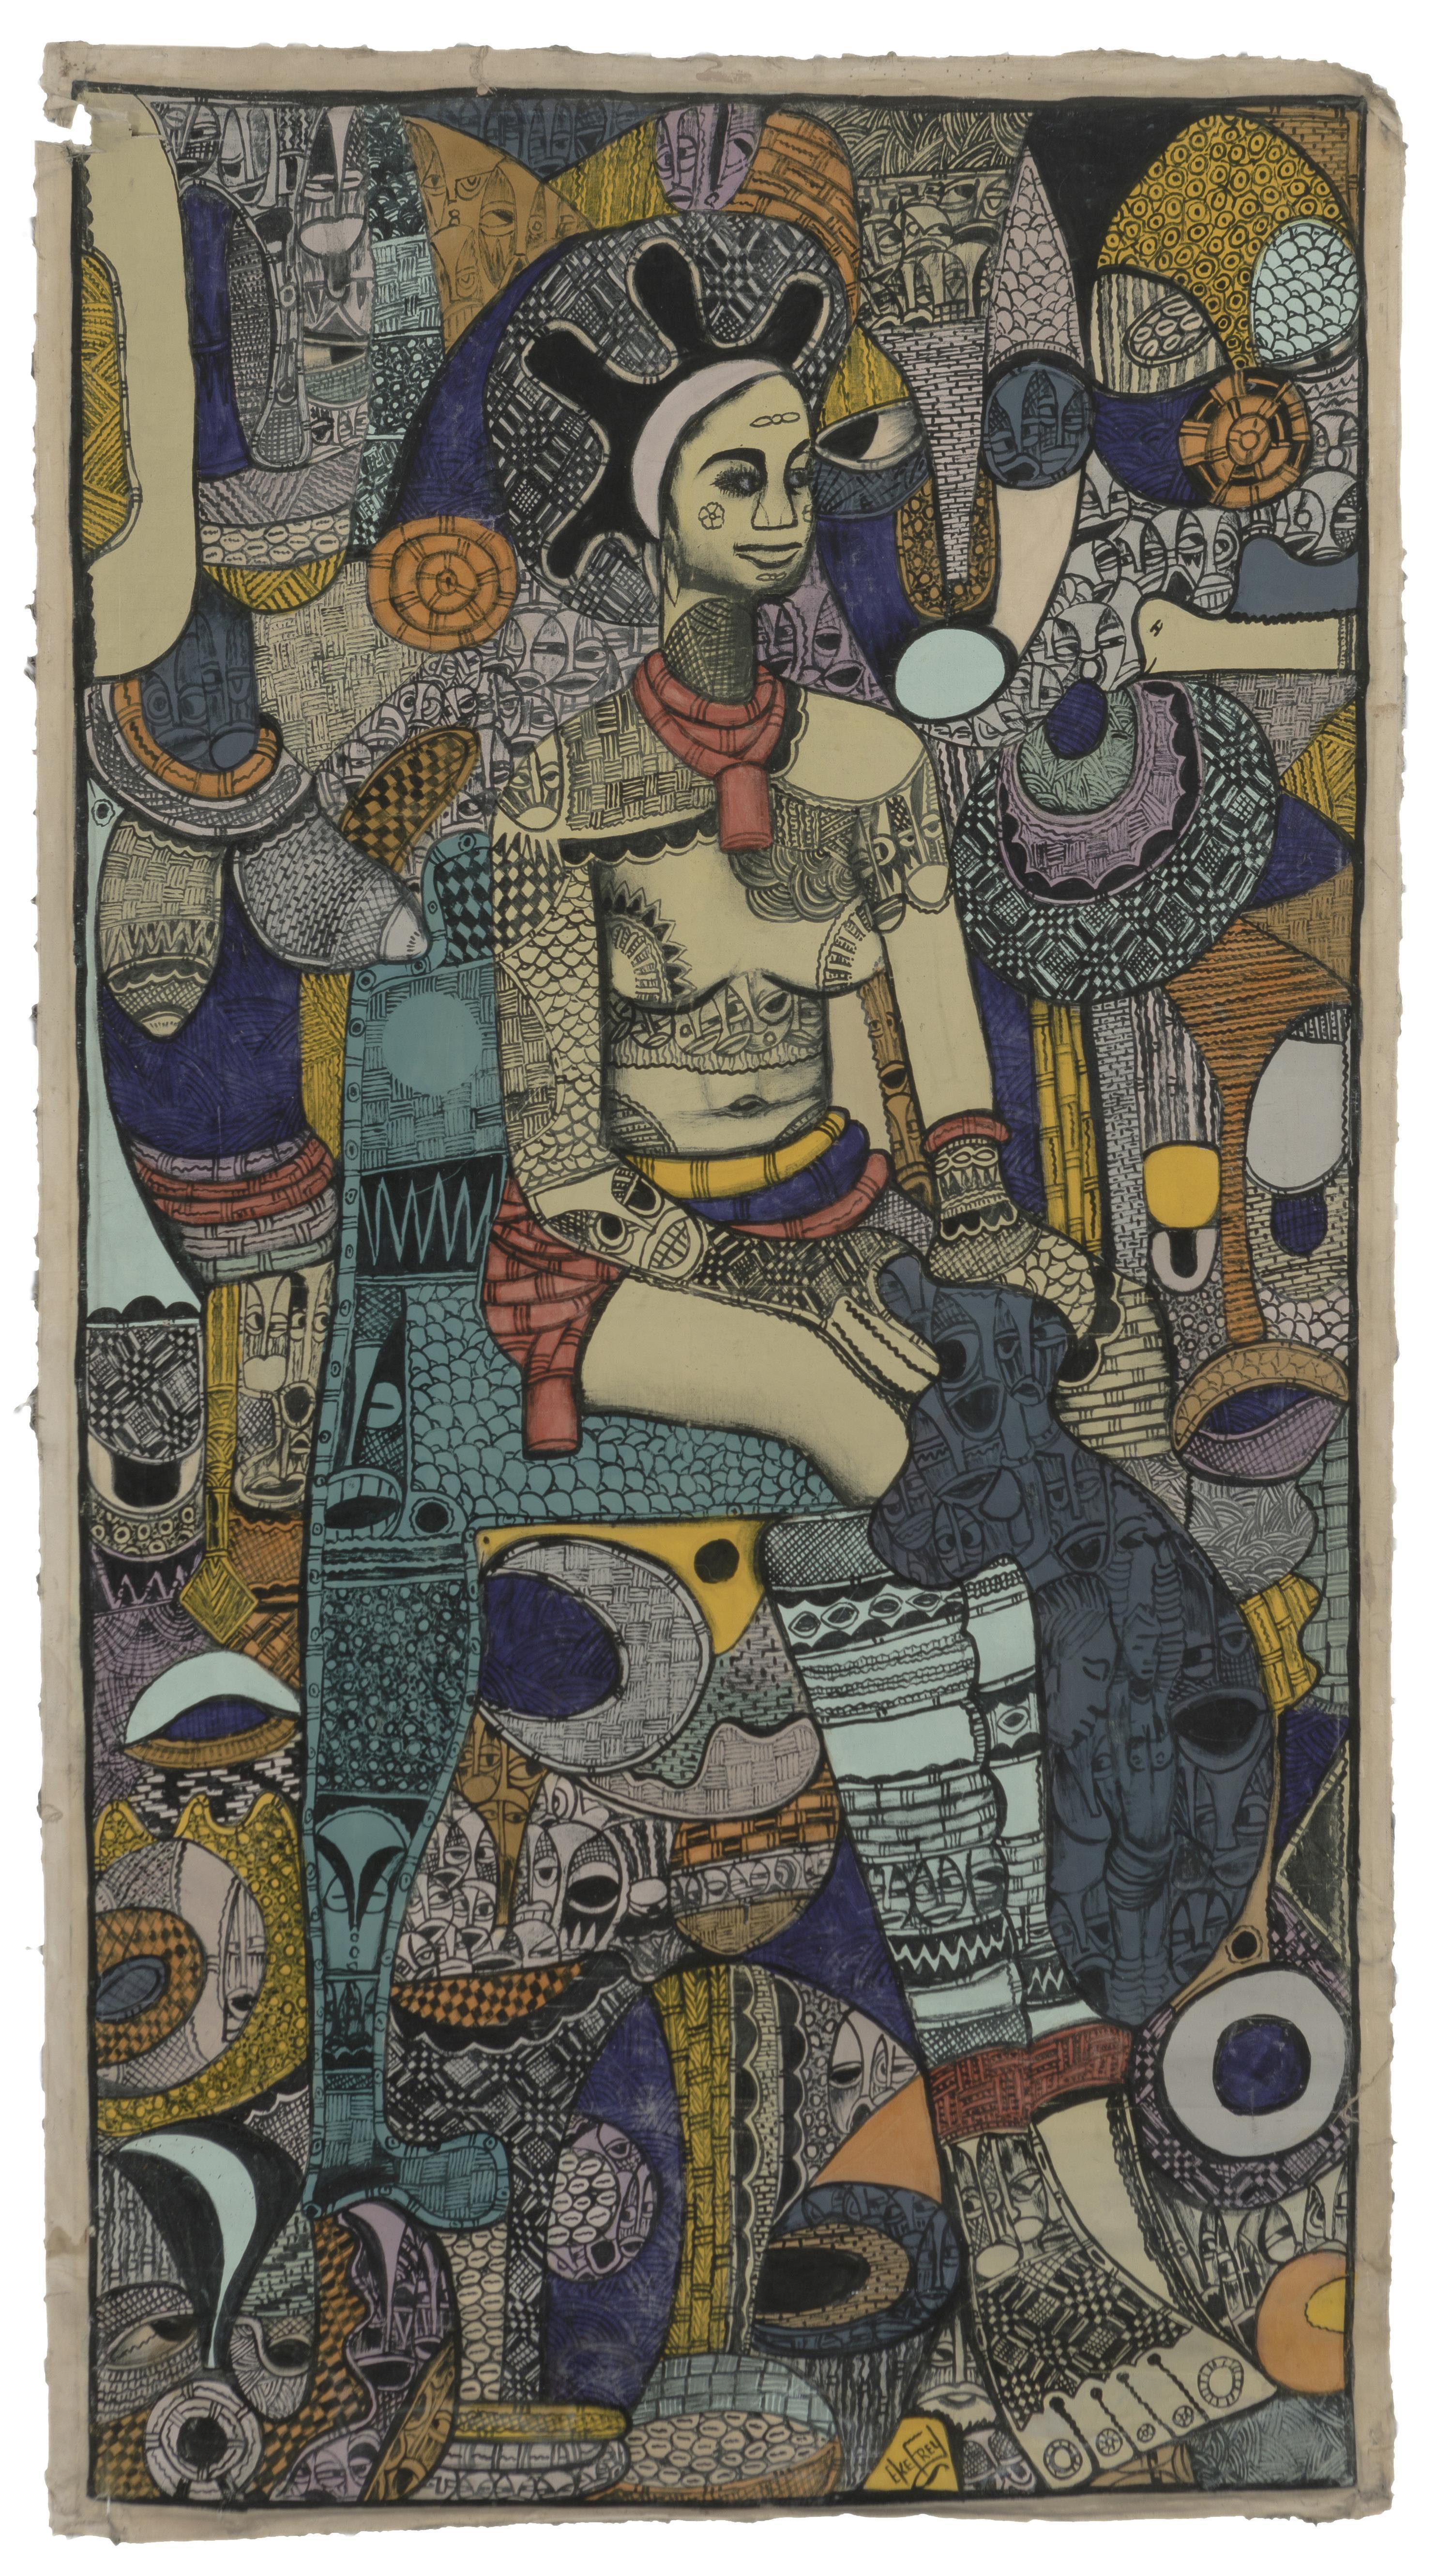 "Emanuel Ekong Ekefrey, (b. 1952 Nigerian), Sitting Nigerian female figure, Mixed media on unstretched canvas, Image: 68"" H x 36.5"" W"